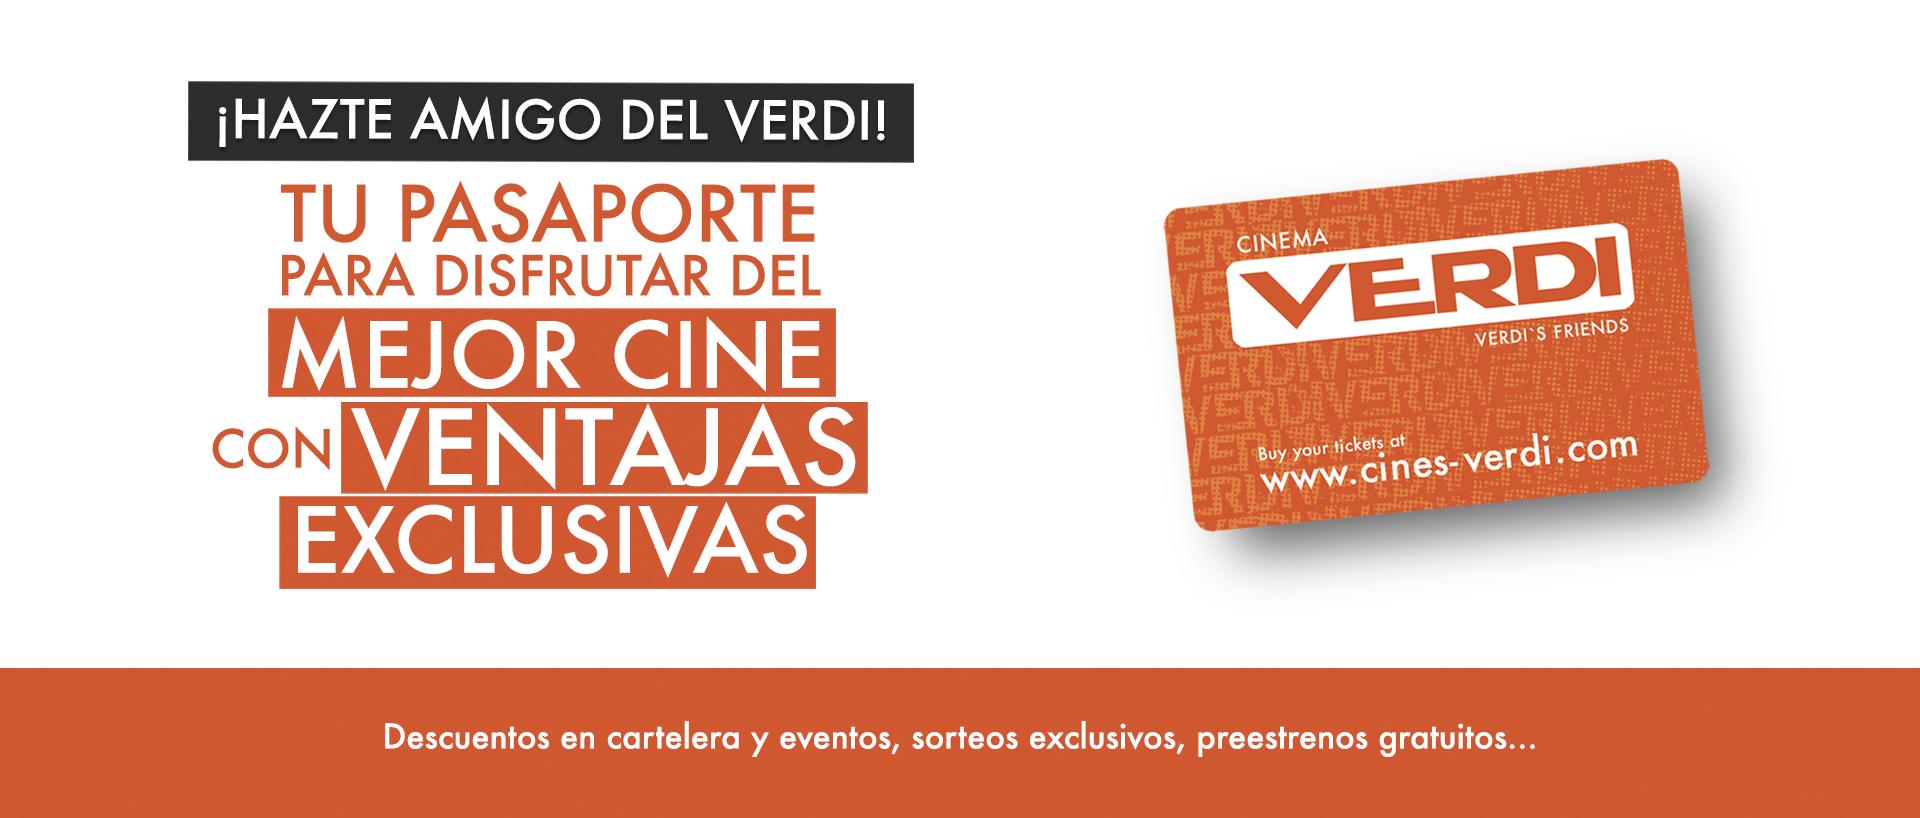 Verdi_Promos_1920x818_04.jpg